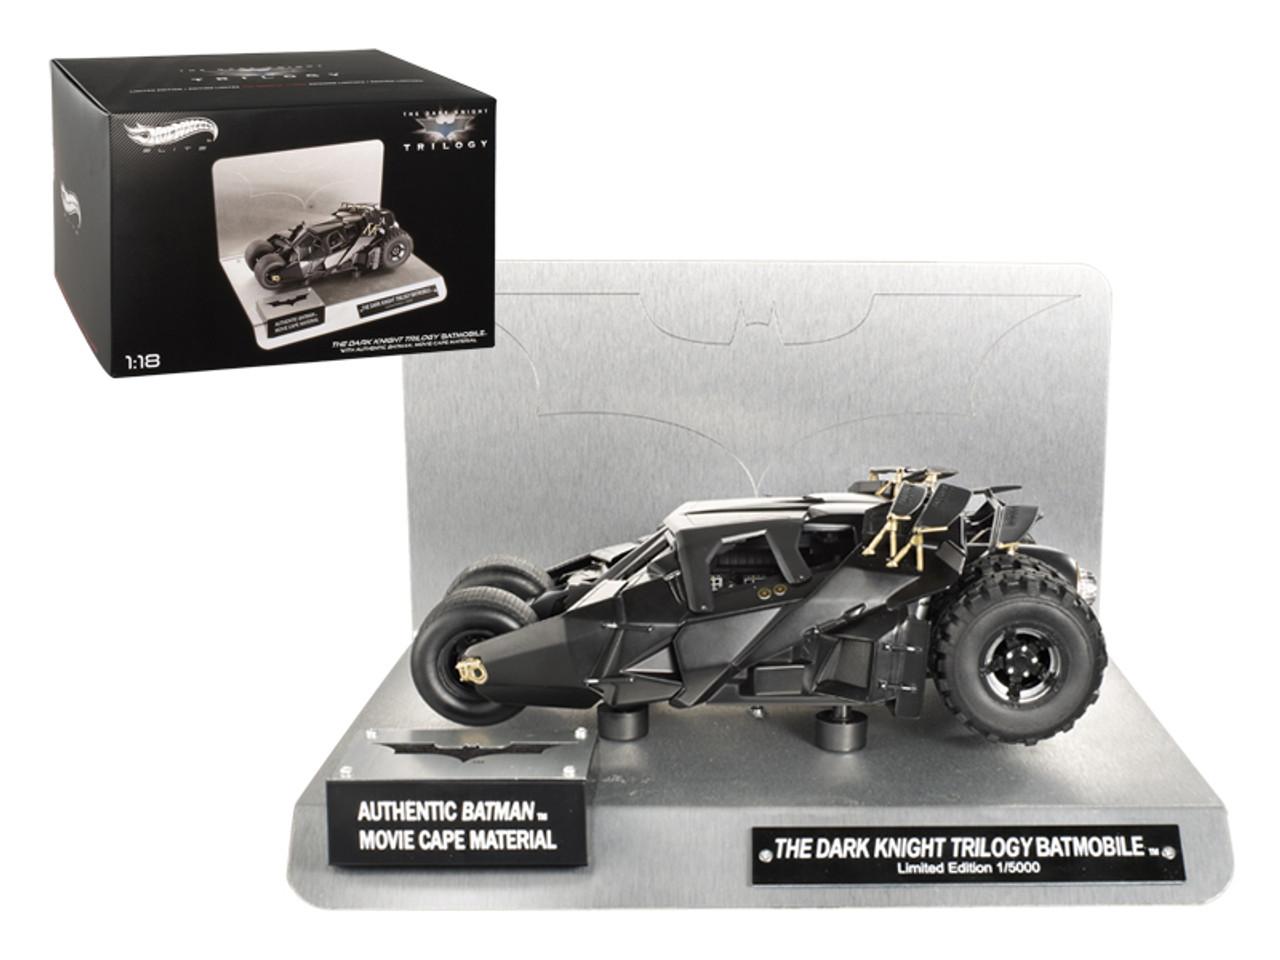 "1/18 Hot Wheels Hotwheels Elite ""The Dark Knight"" Trilogy Batmobile With Authentic Movie Batman Cape Material Diecast Car Model"